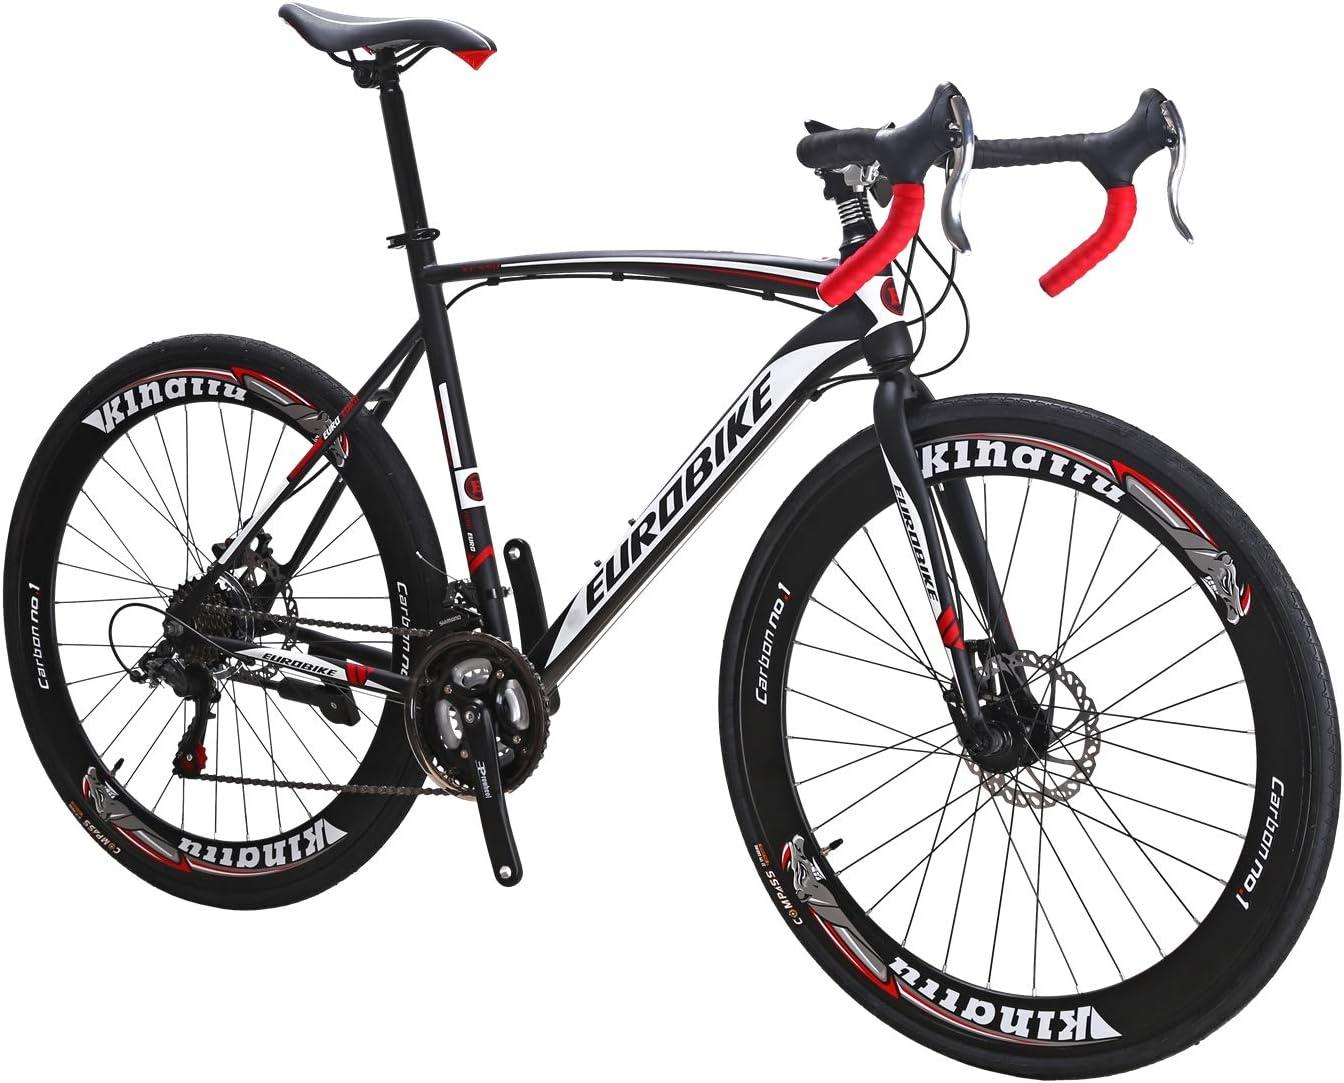 EUROBIKE XC550 ロードバイク自転車 700C 変速21速 ディスクブレーキ 自転車 ロード